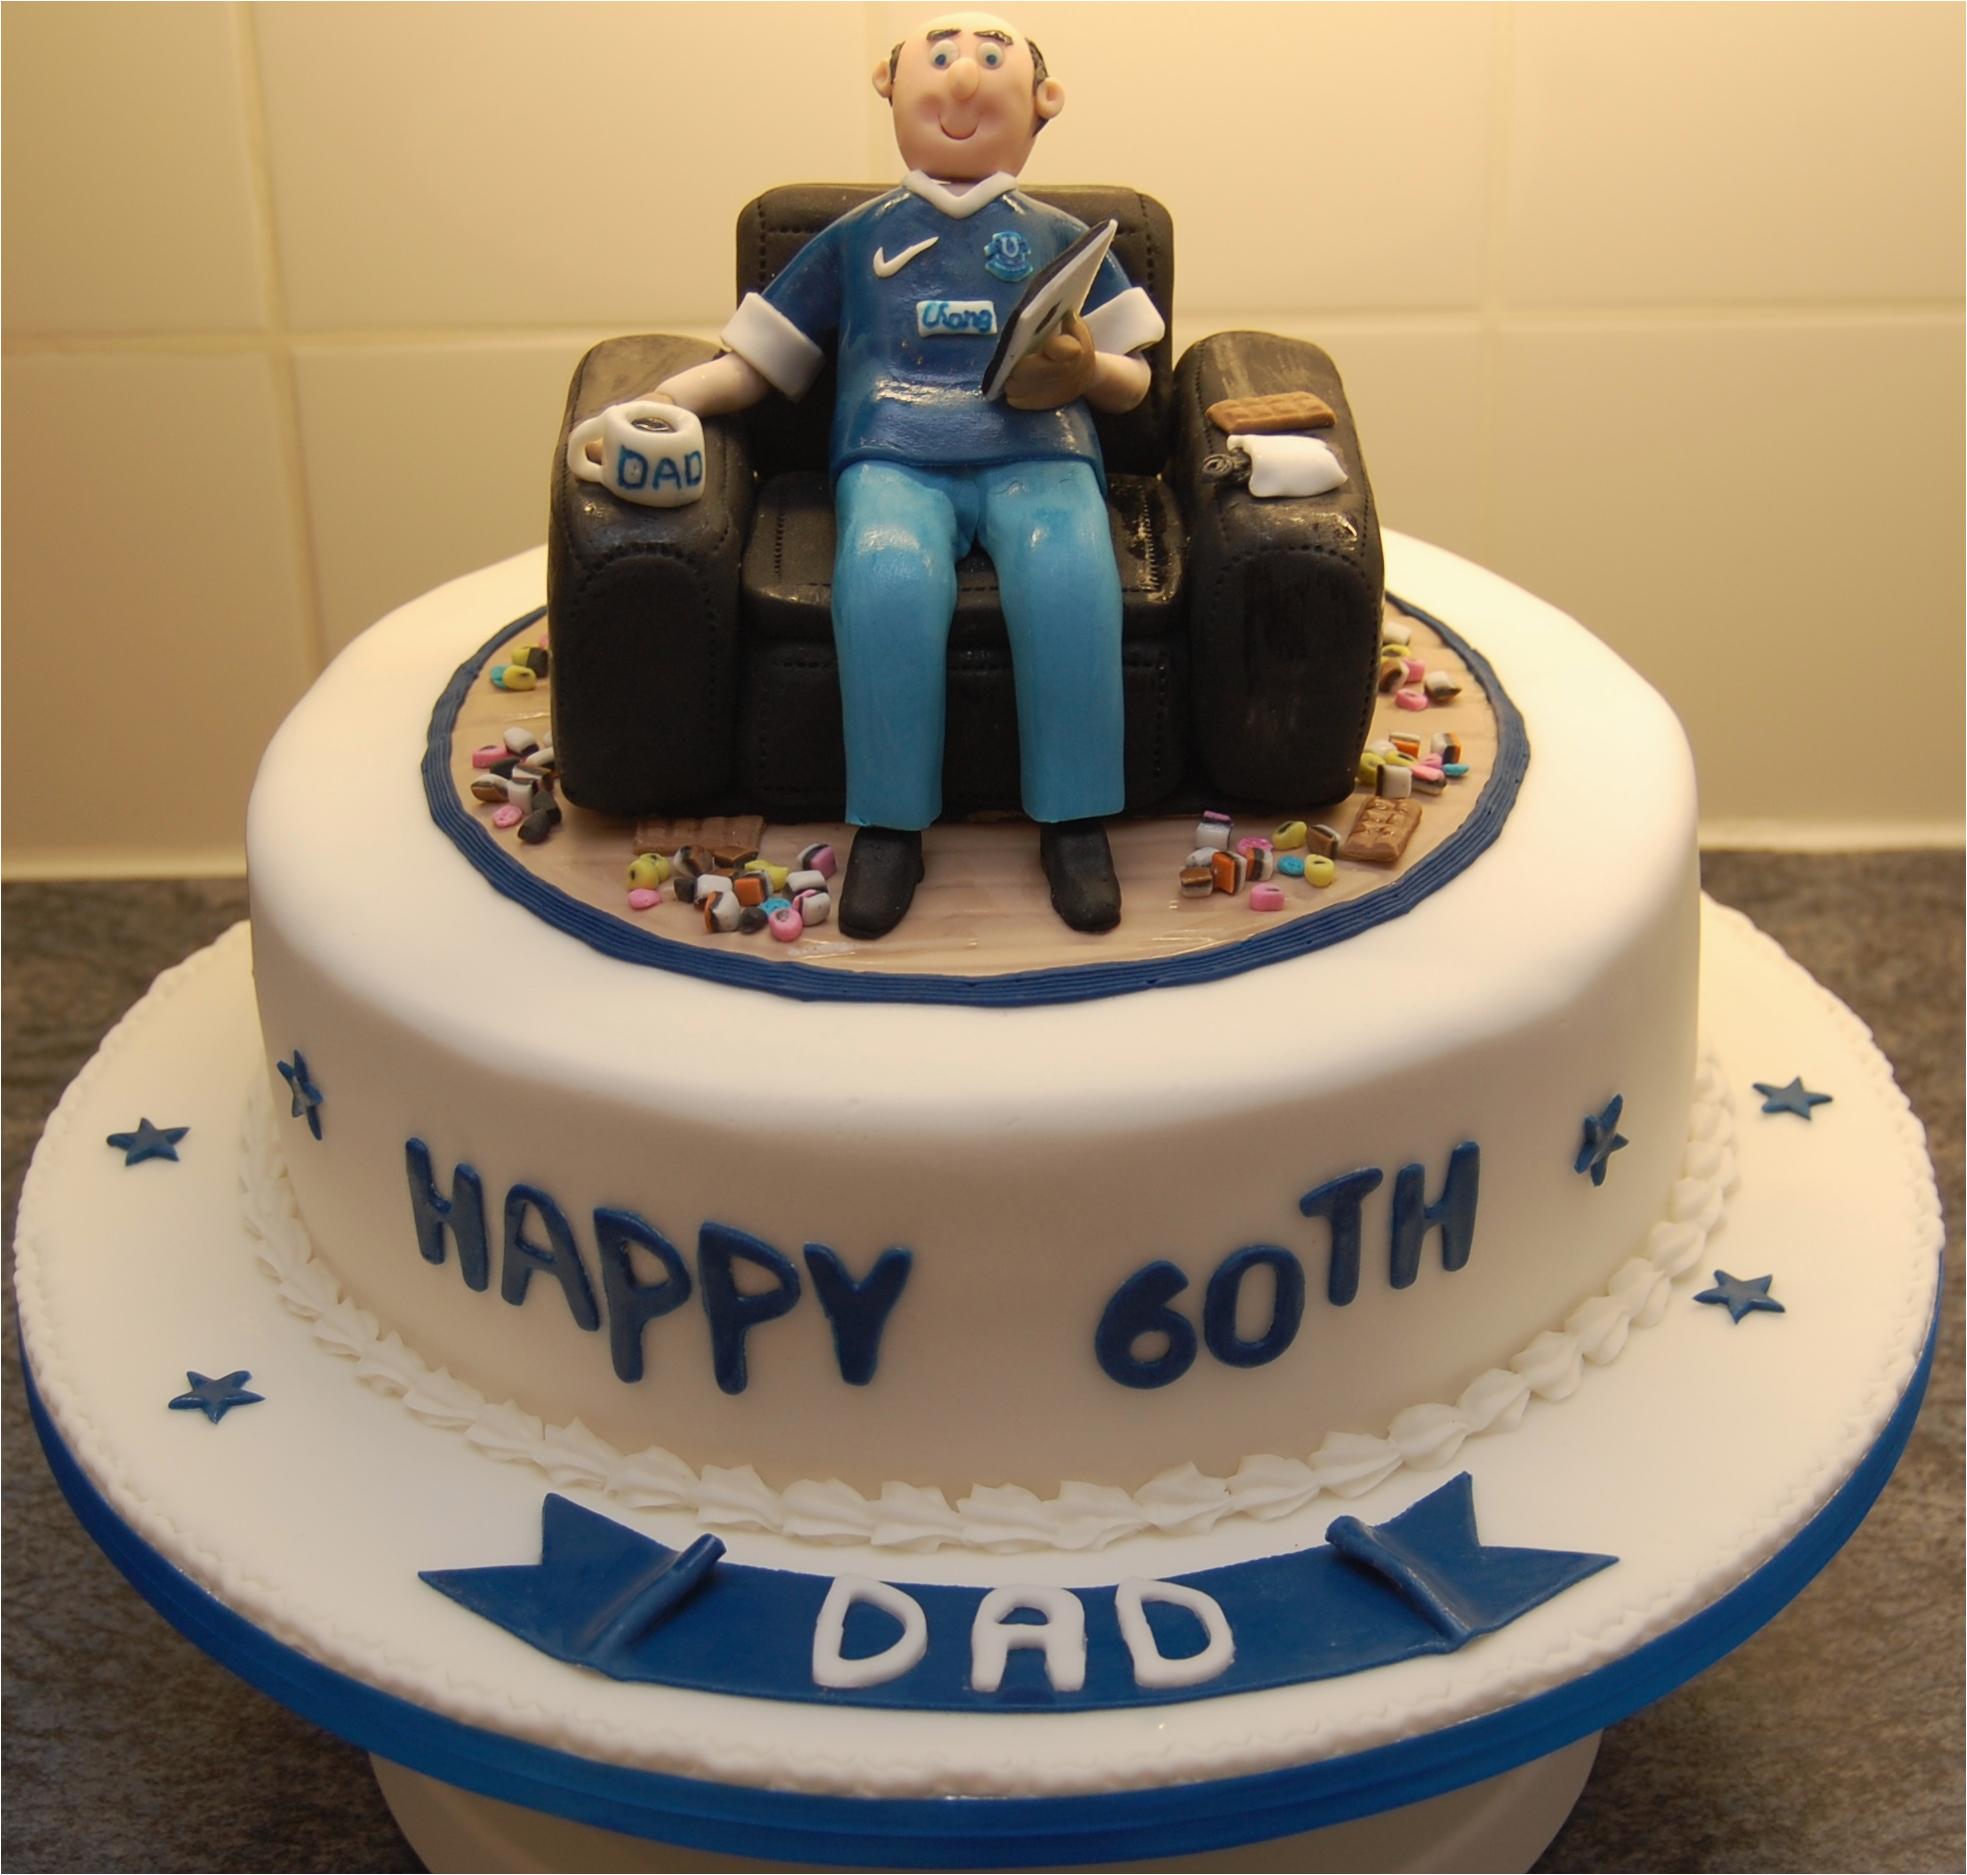 60th birthday cake everton fan sat in an armchair